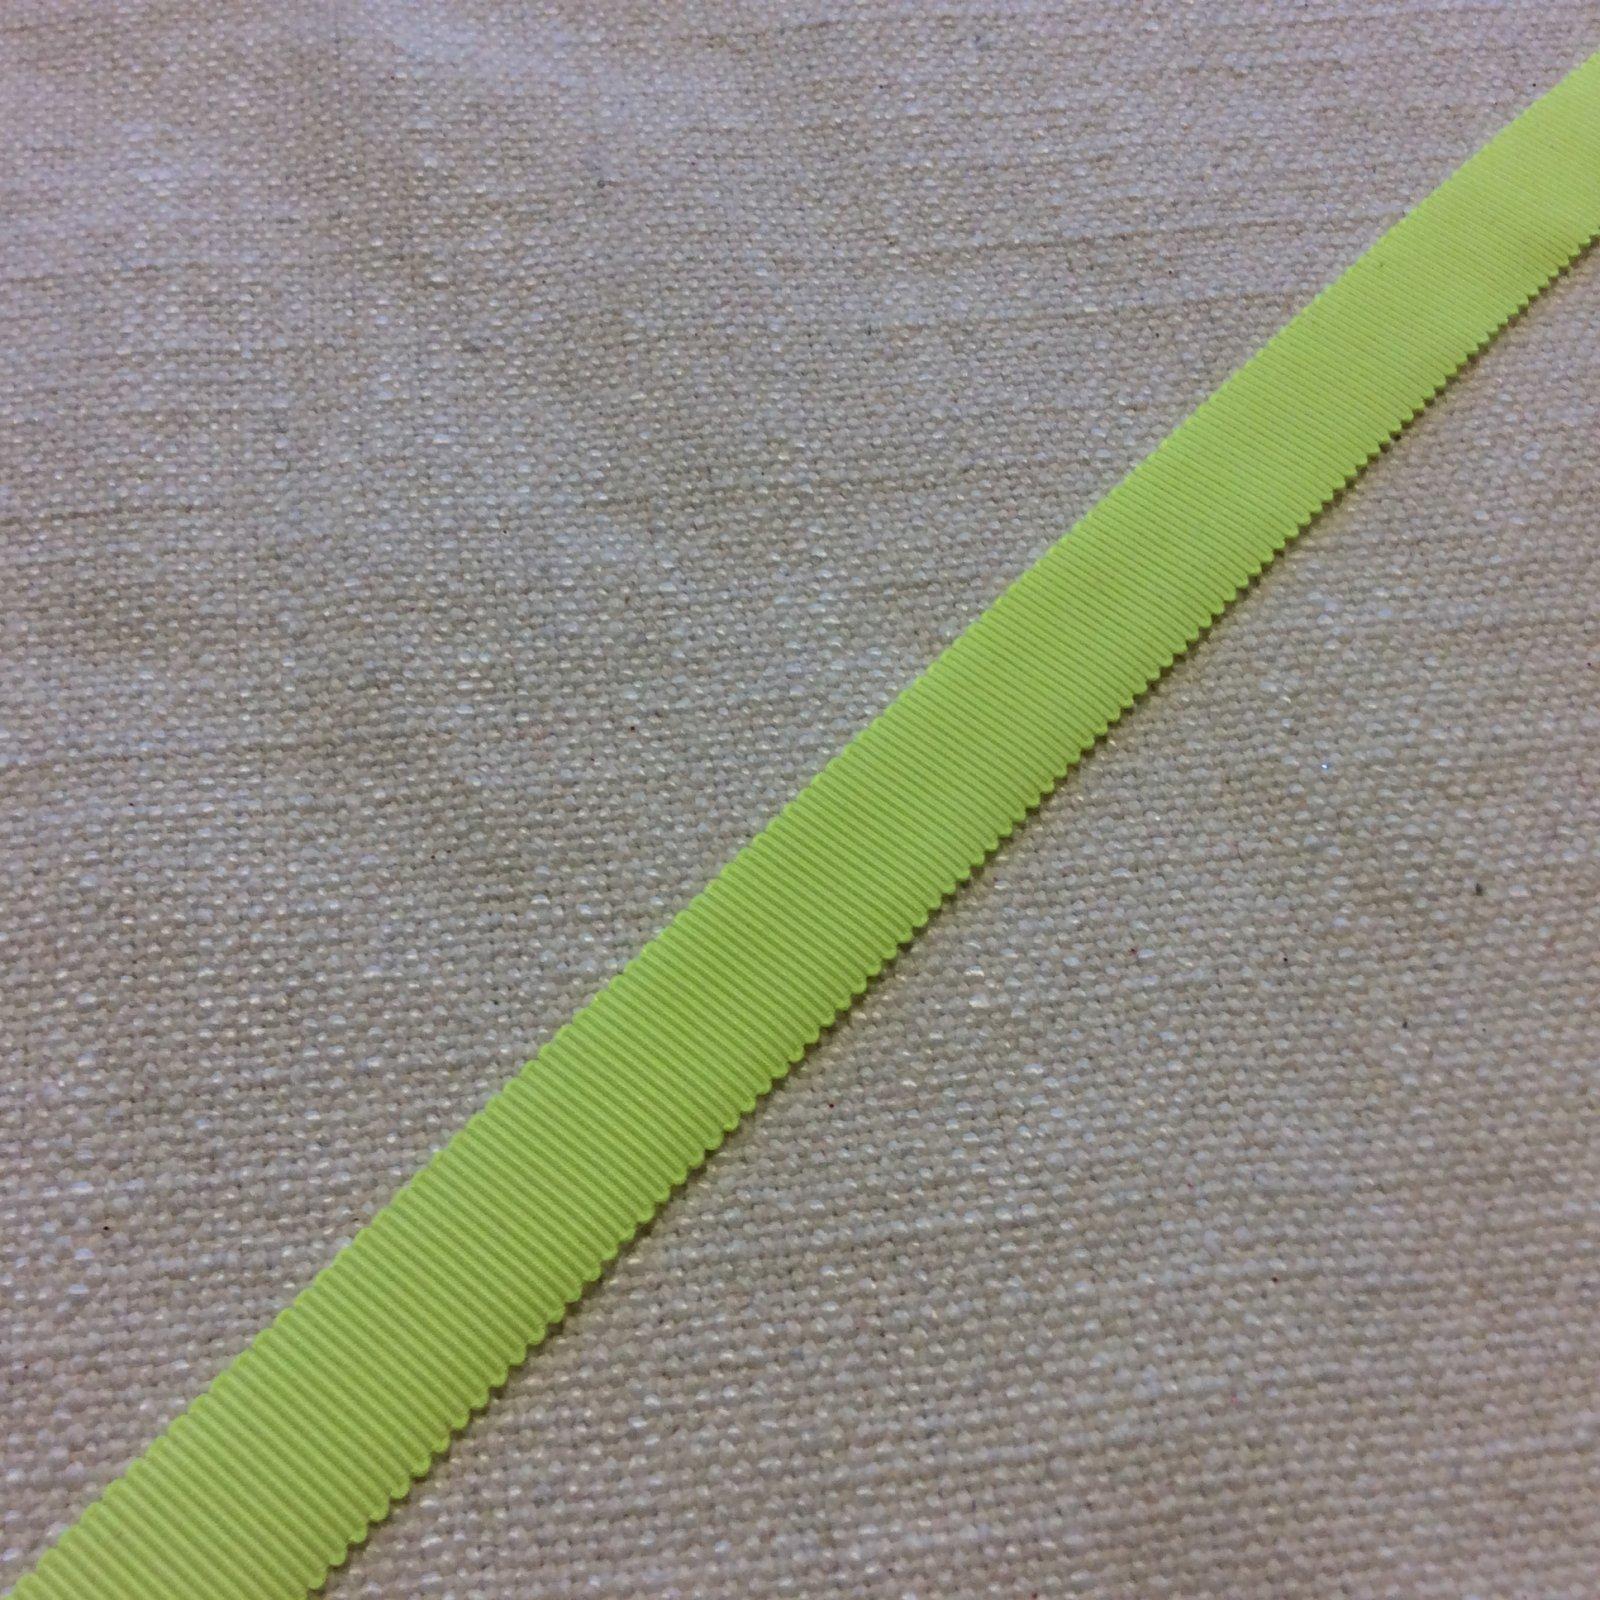 Grosgrain Ribbon 5/8 High End Japanese Woven Fluorescent Yellow Trim Ribbon RIB1168